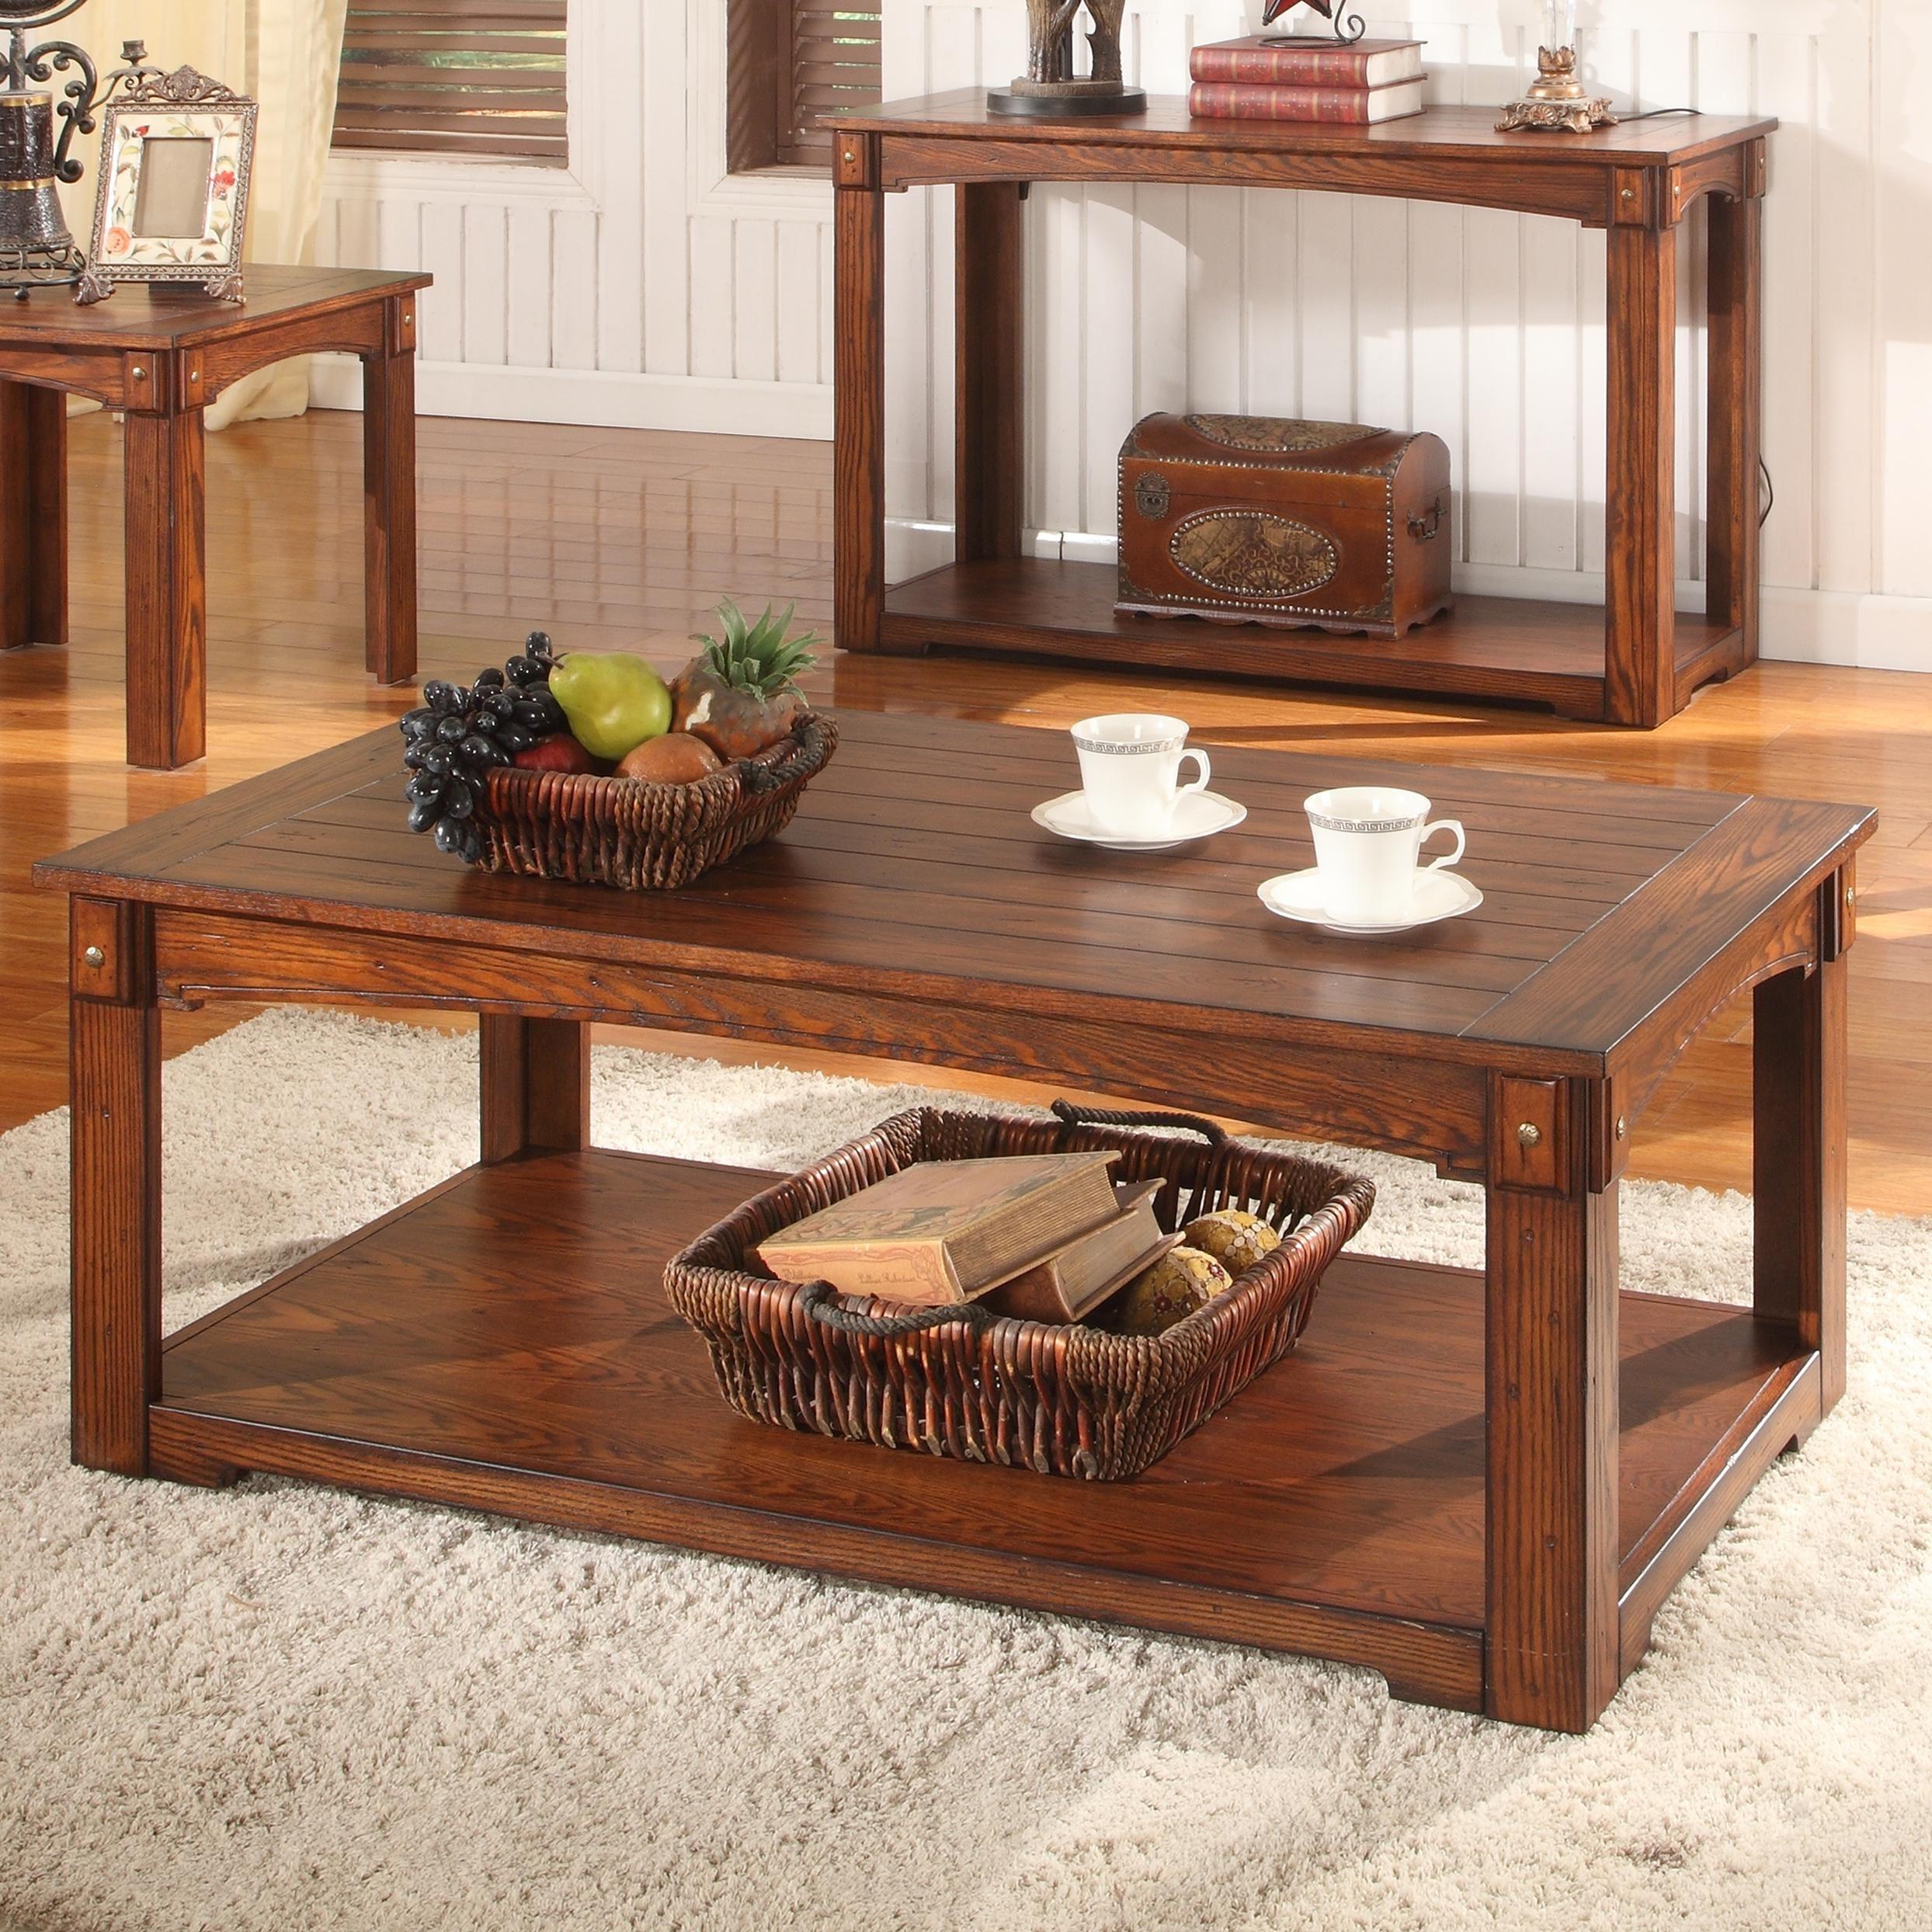 Duplex Oak Coffee Table Furniture Design Wooden Wooden Living Room Square Living Room Table [ 1500 x 1500 Pixel ]